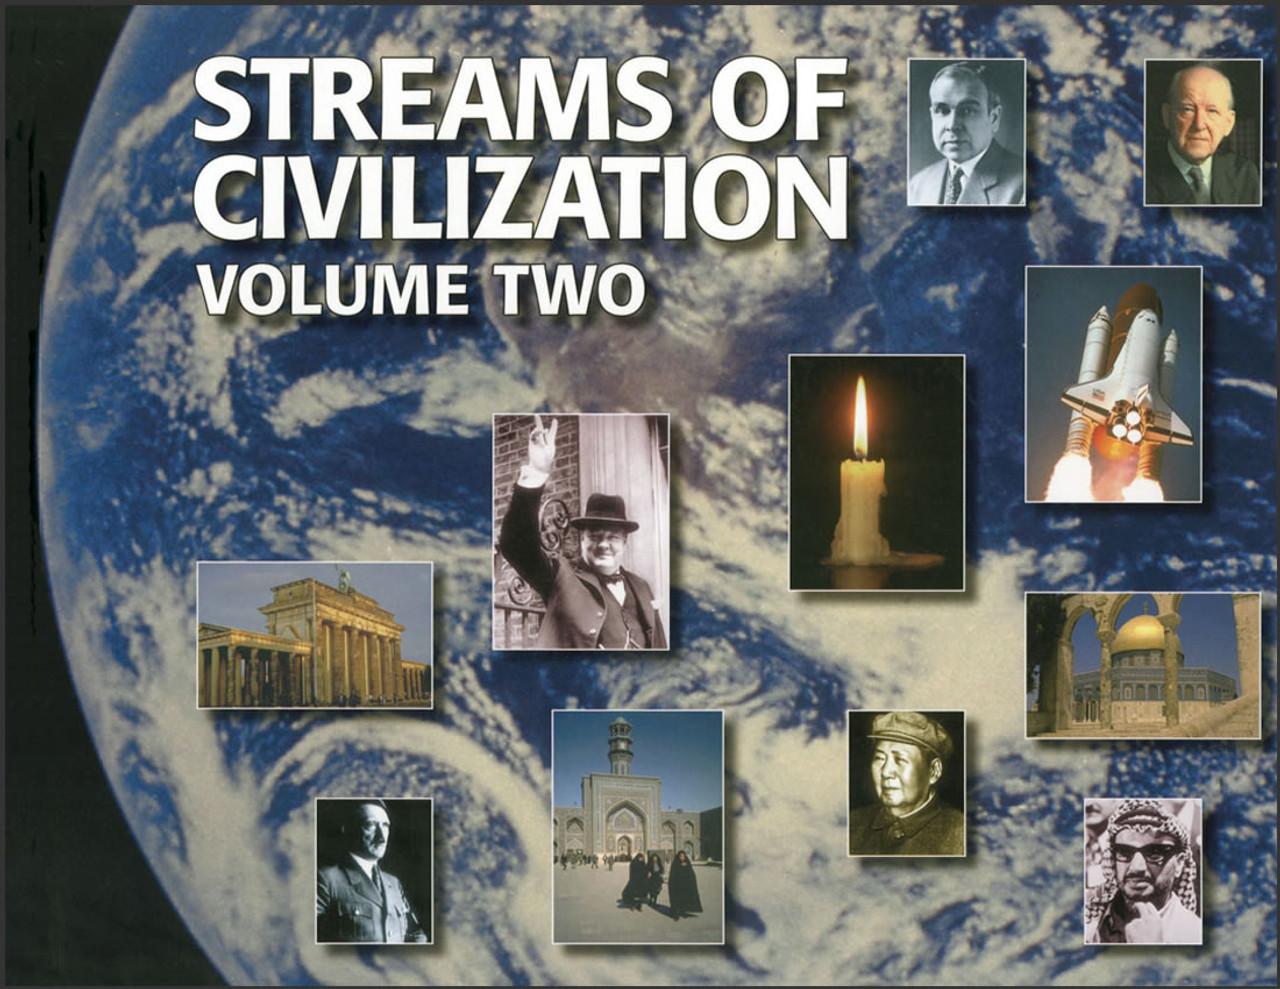 Streams of Civilization Volume 2, 2nd edition